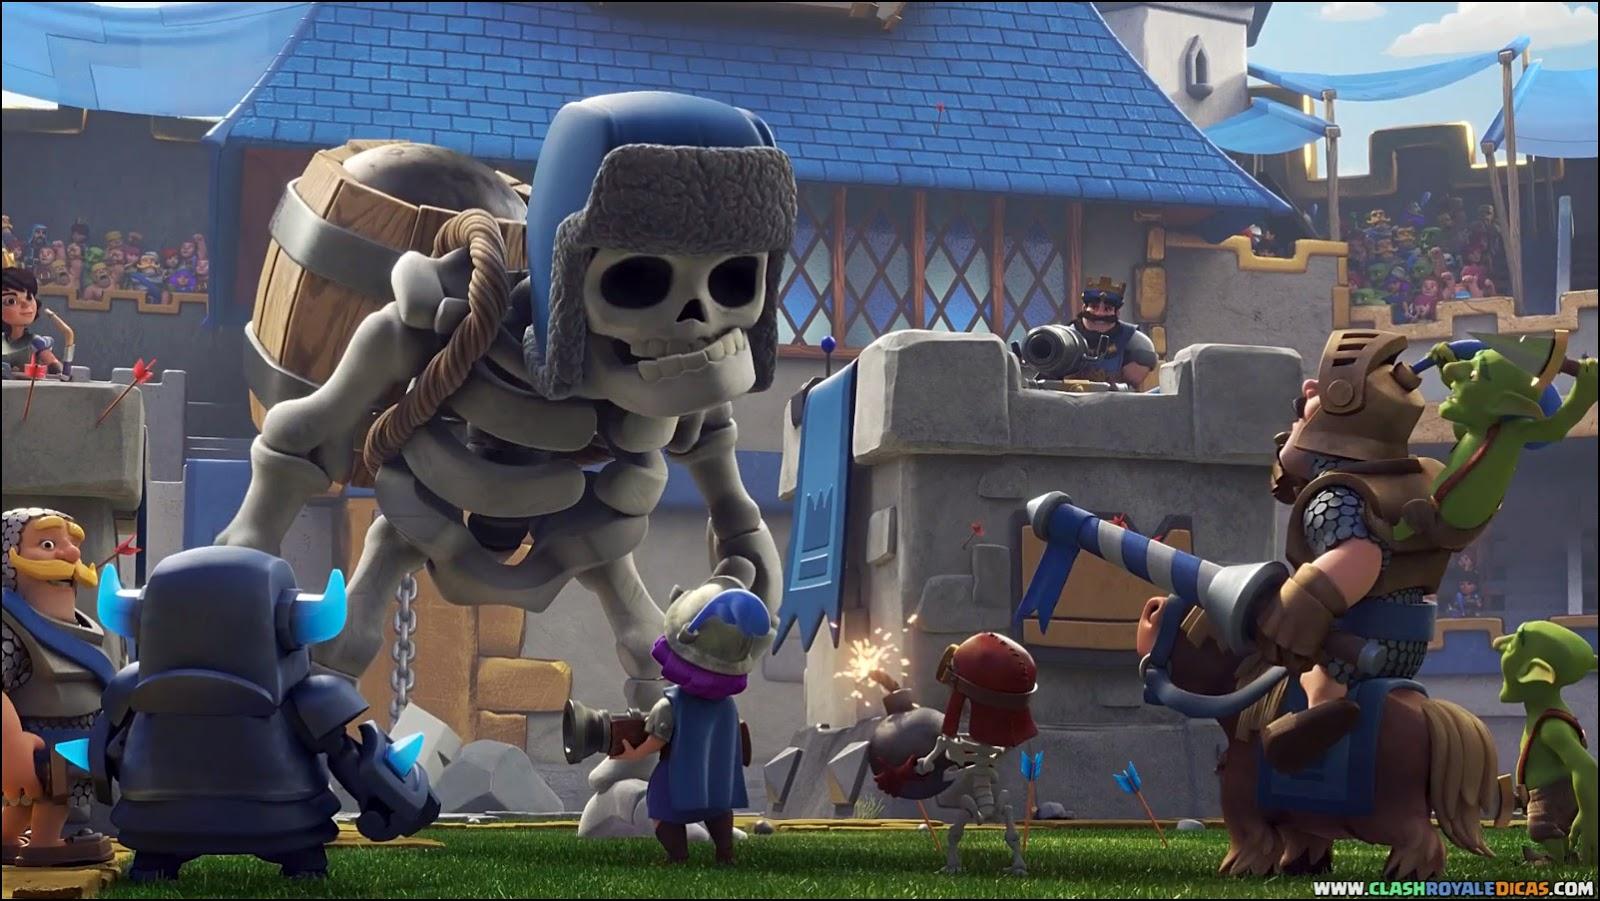 Clash Royale Wallpaper - Clash Royale Esqueleto Gigante , HD Wallpaper & Backgrounds